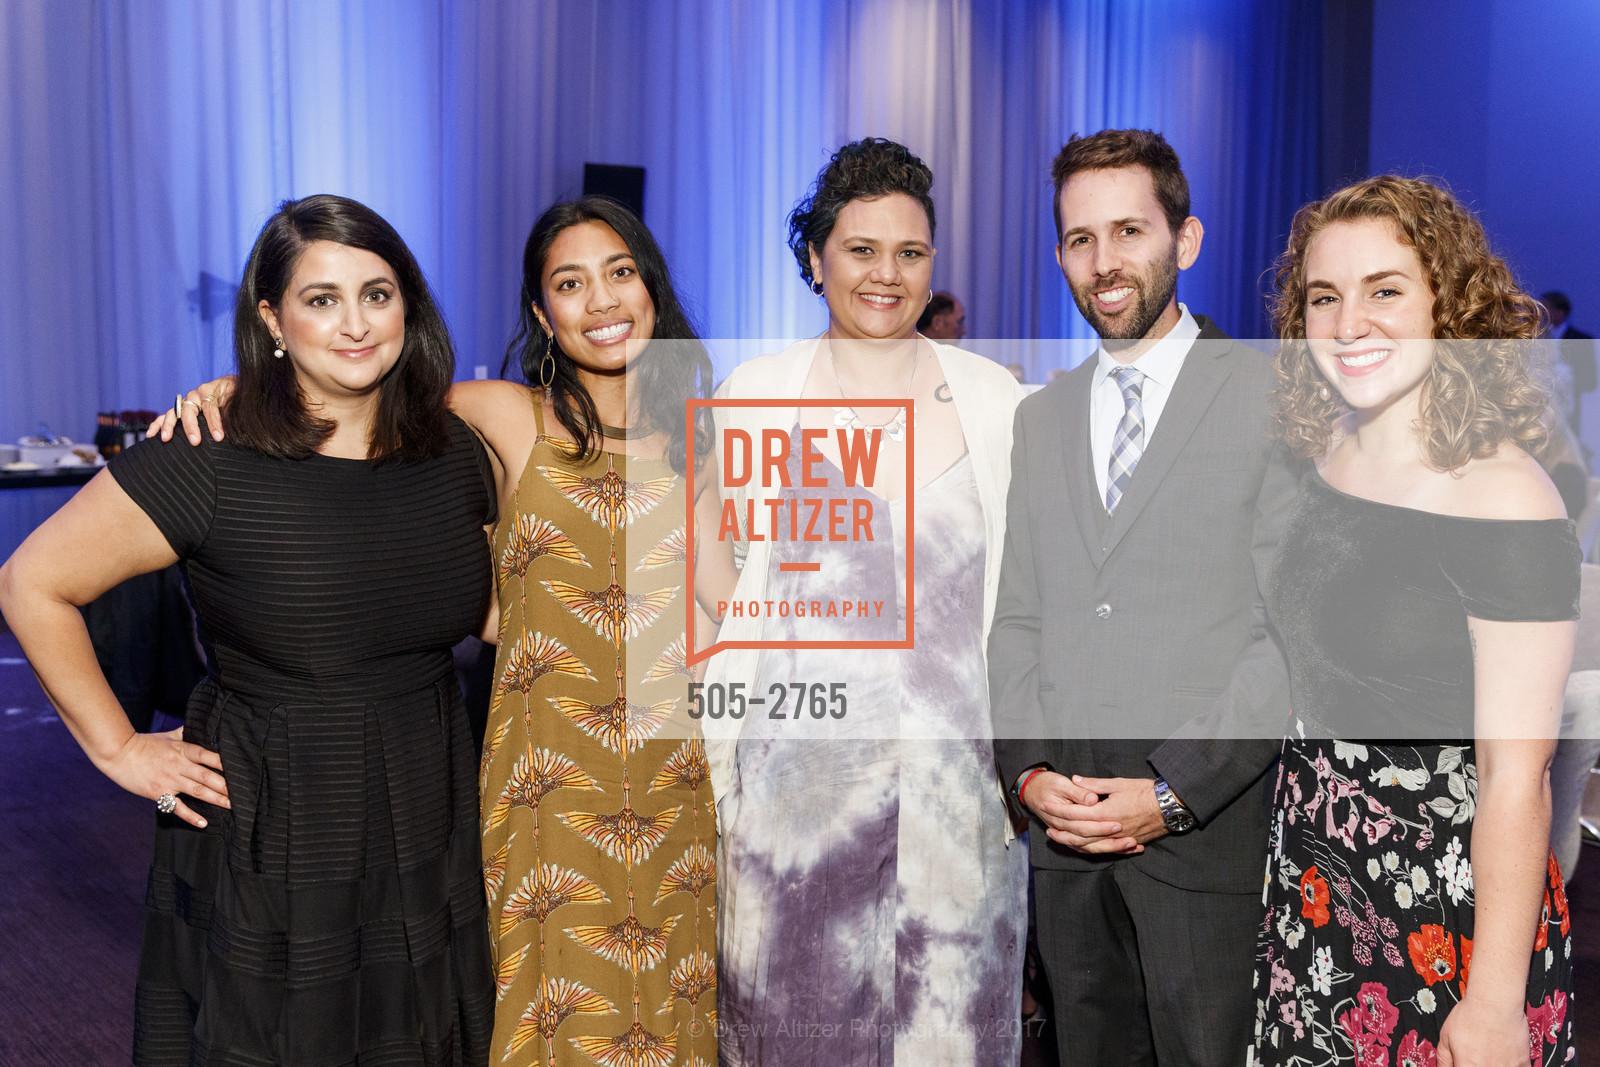 Shyla Batliwalla, Ally Subrahsanyan, Mylea Joe, Adam Moscowits, Sandy Rosenthal, Photo #505-2765